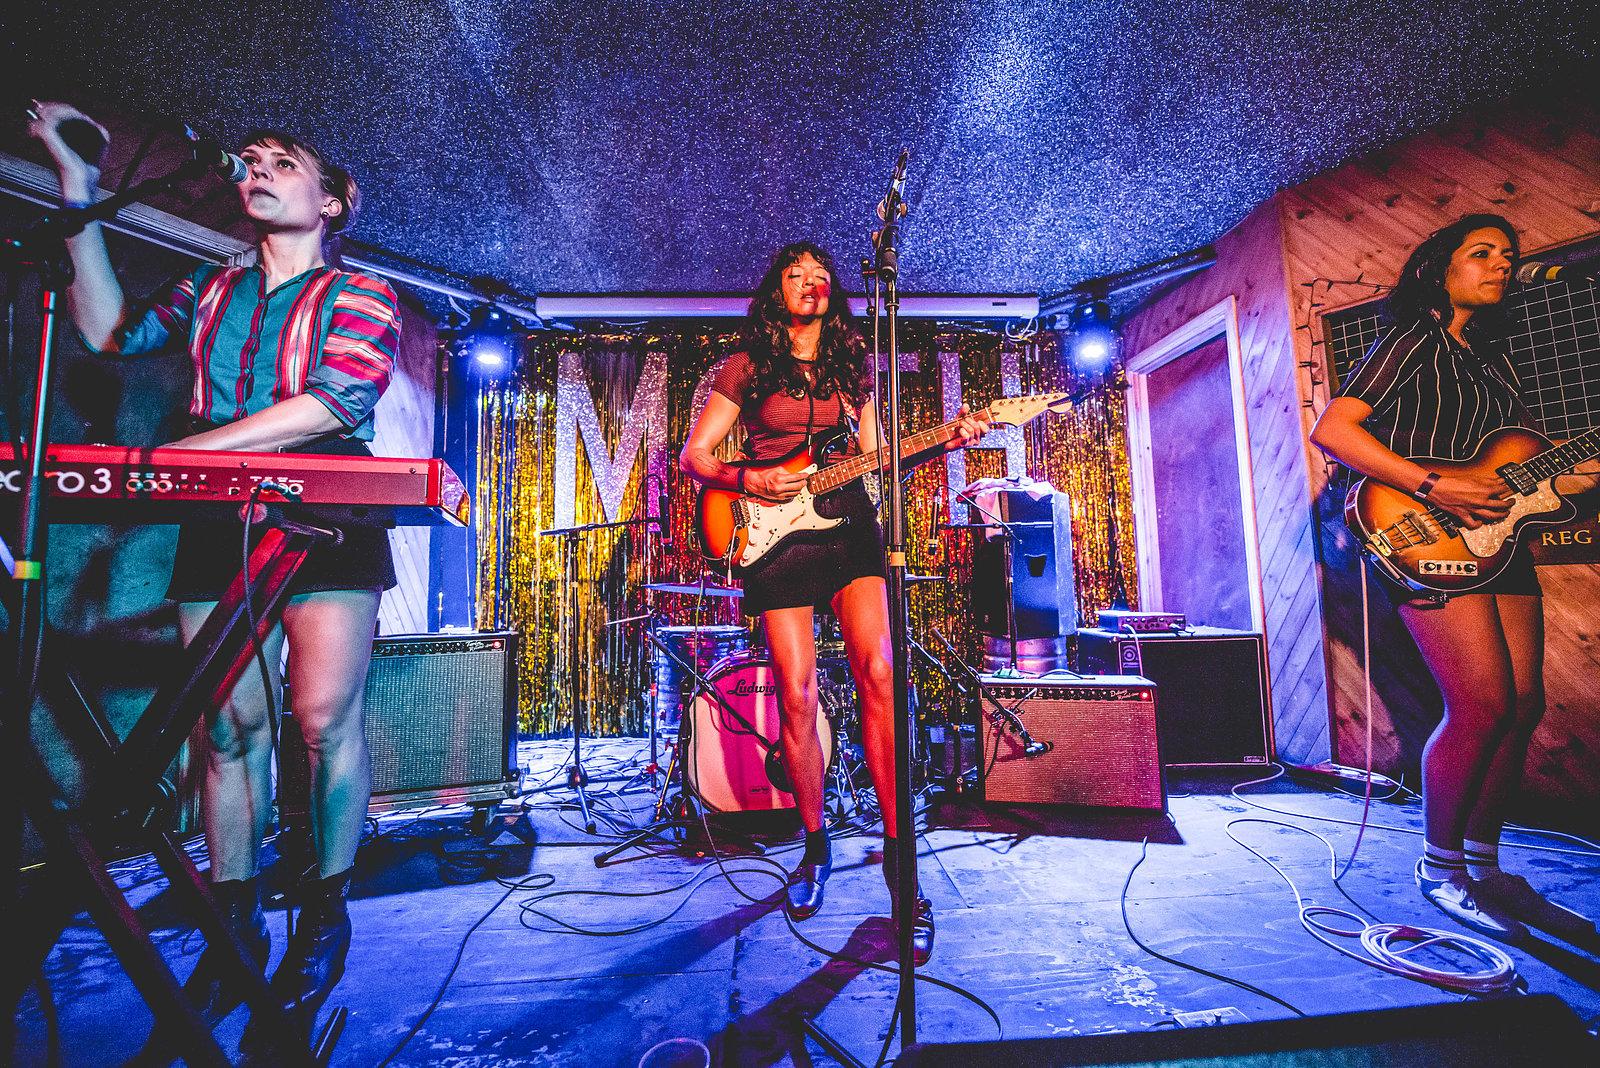 La Luz at Moth Club, September 2016